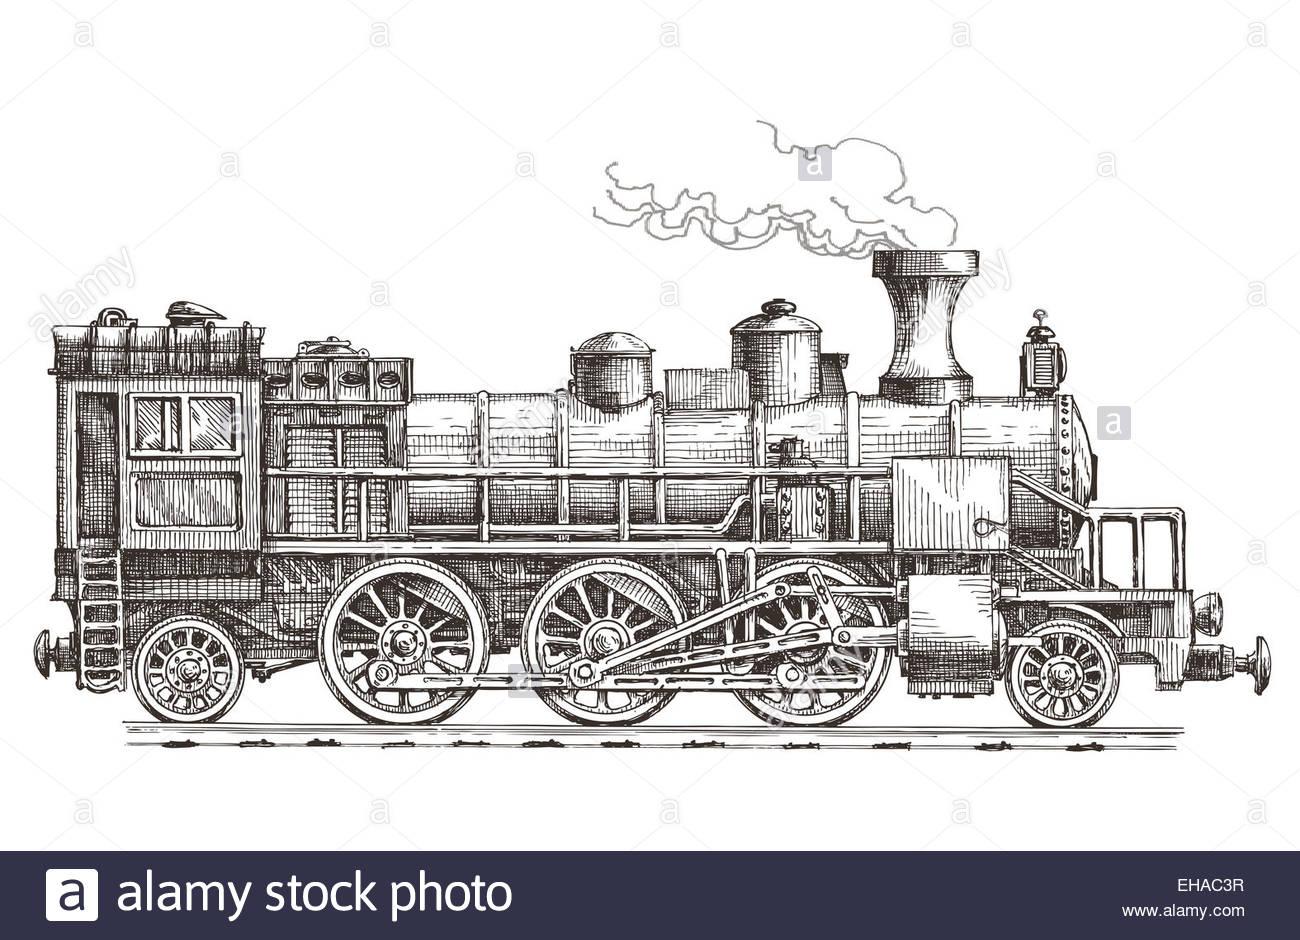 1300x940 Retro Steam Locomotive Vector Logo Design Template. Train